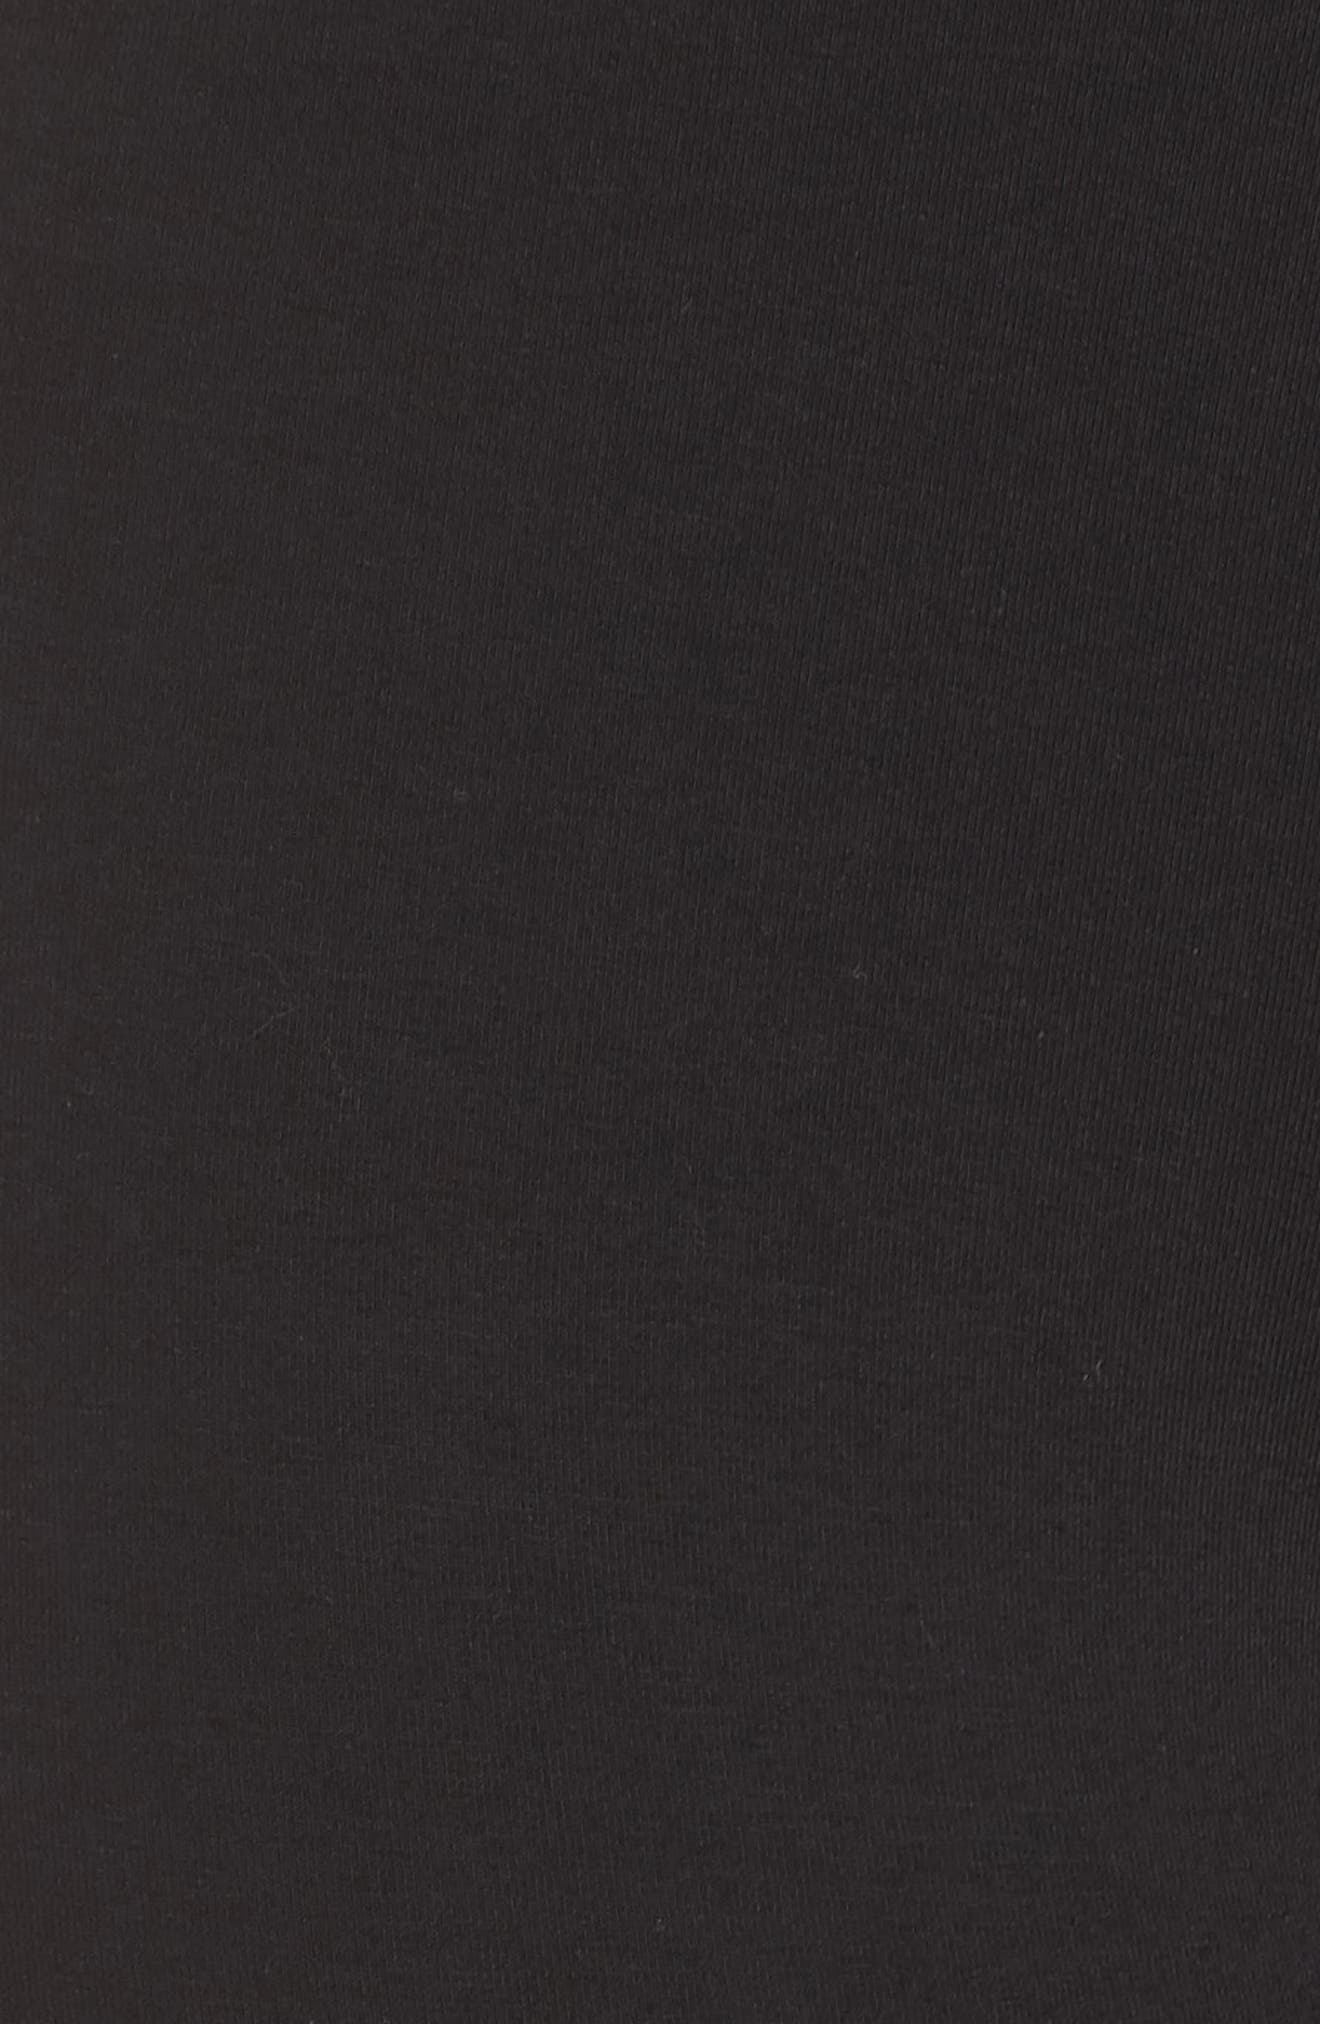 ADIDAS ORIGINALS, adidas 3-Stripes Tights, Alternate thumbnail 6, color, 002